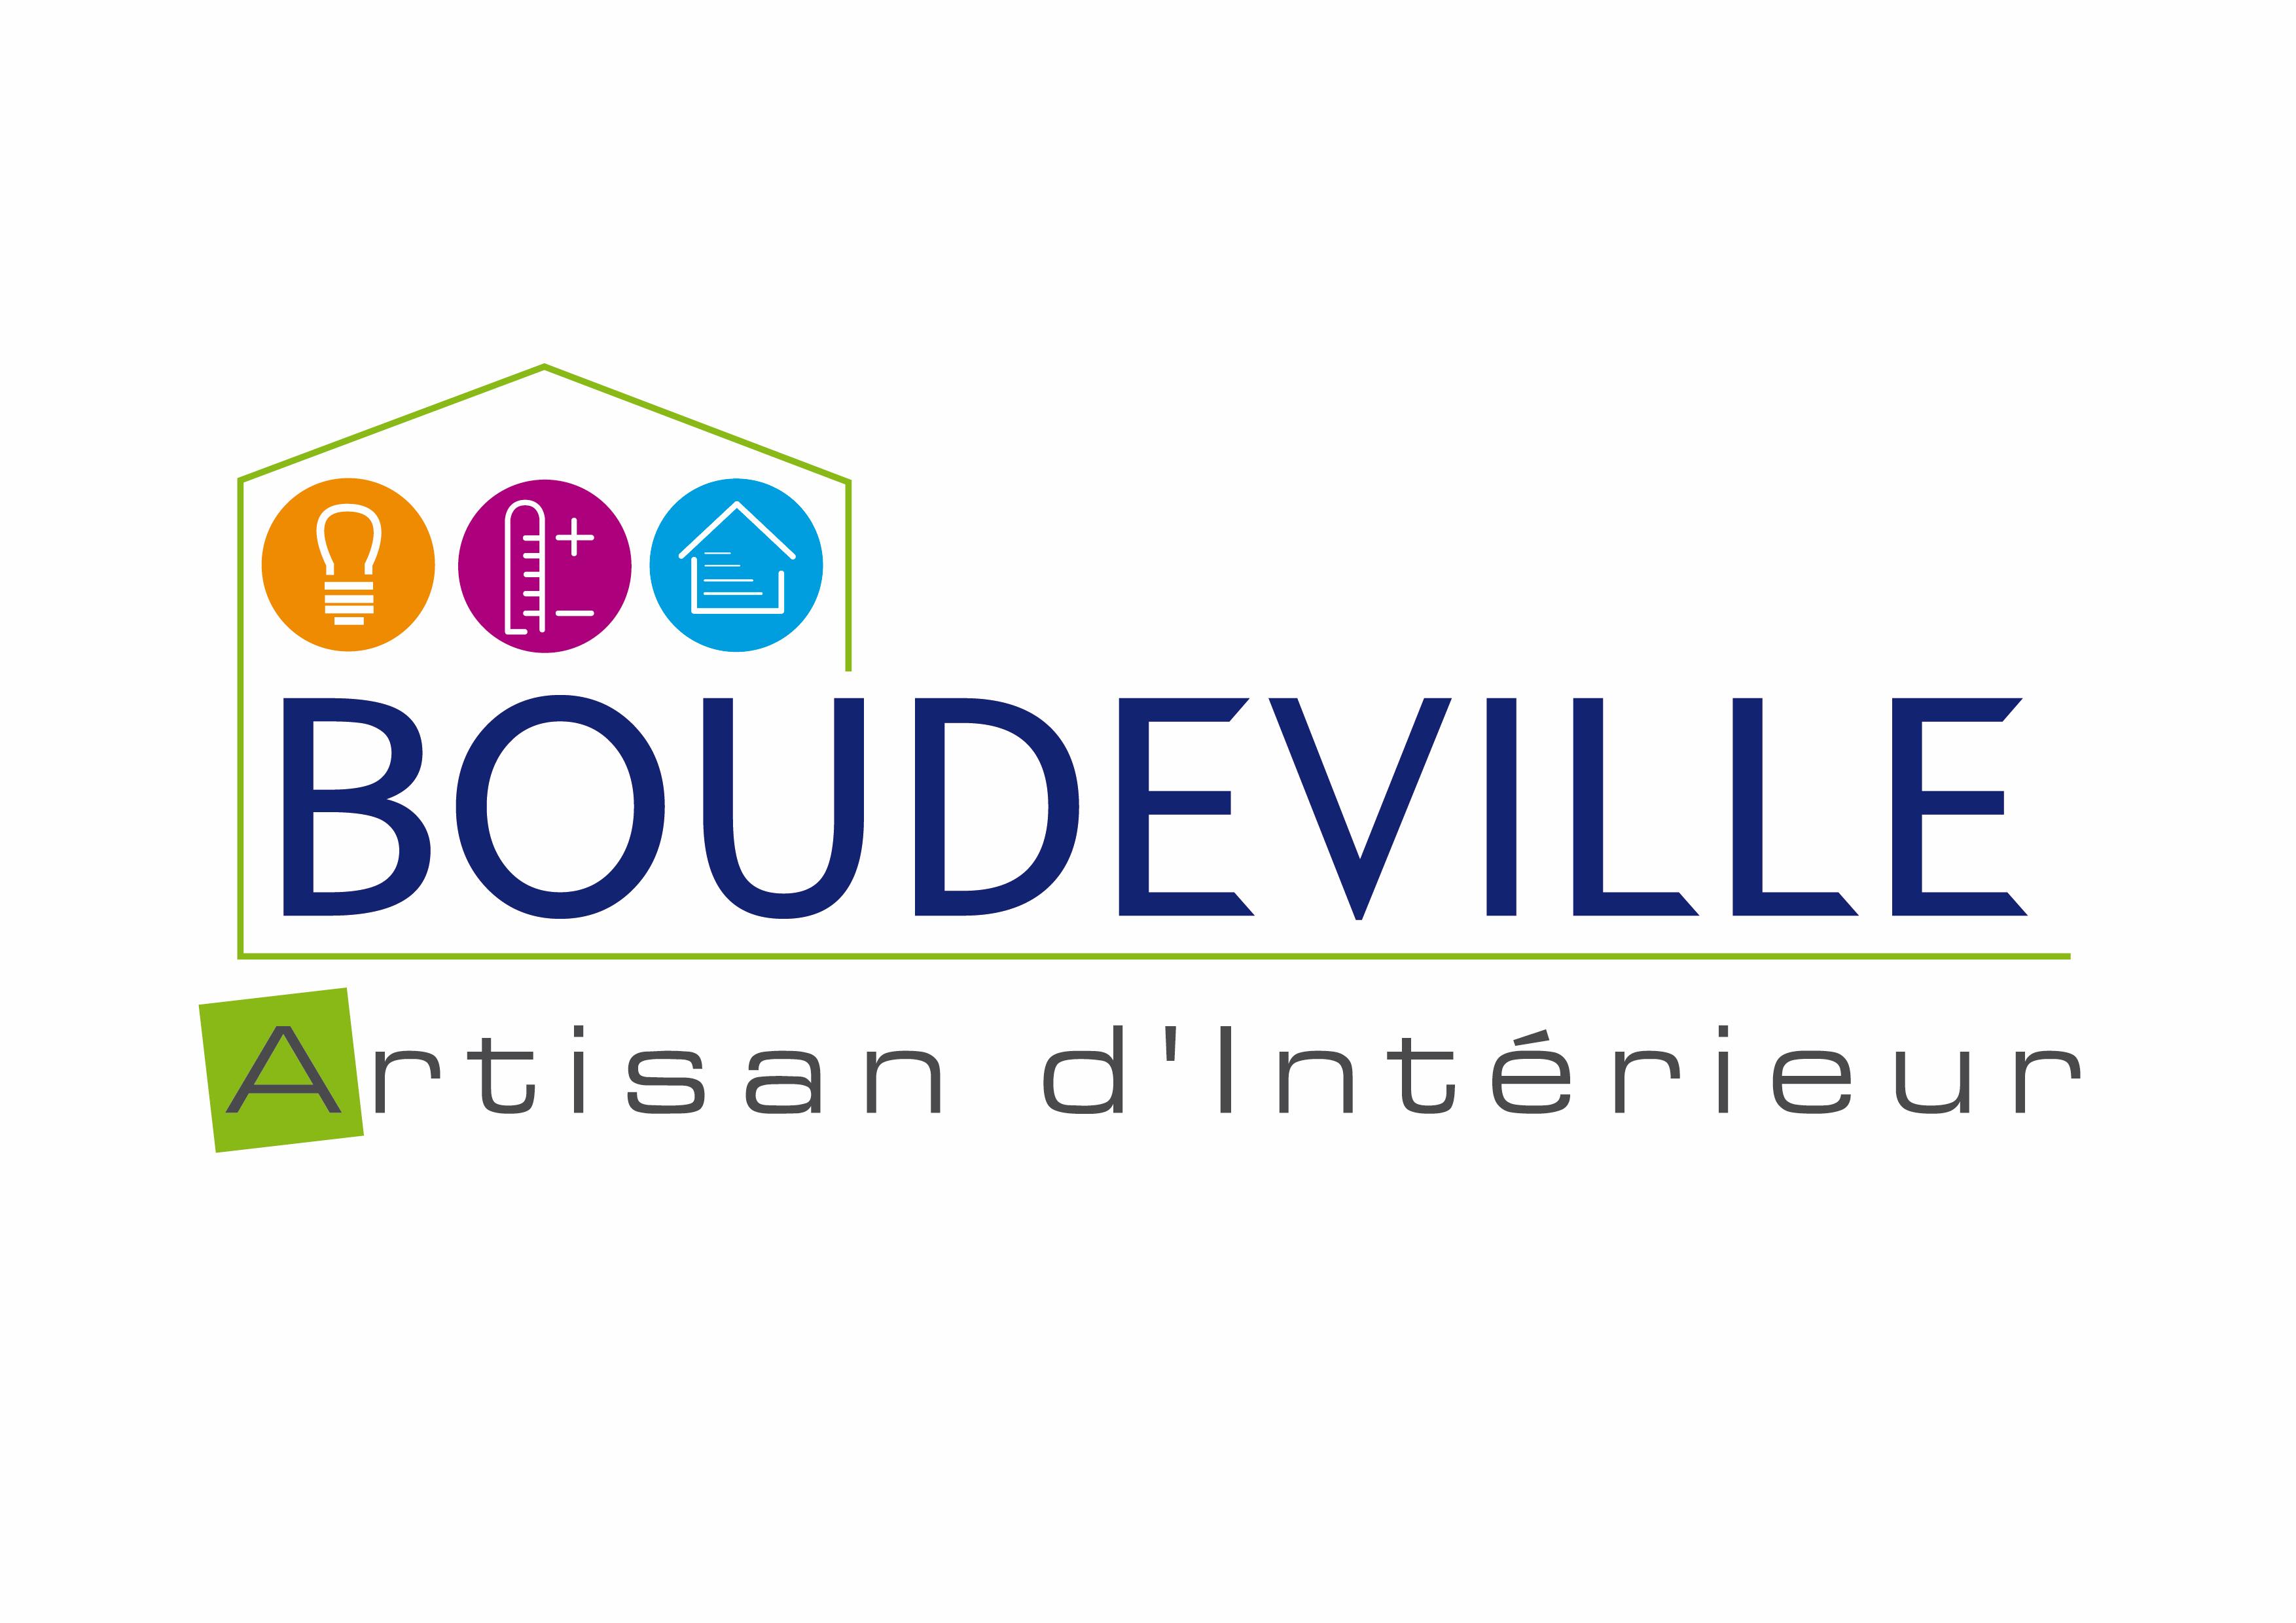 Boudeville artisan